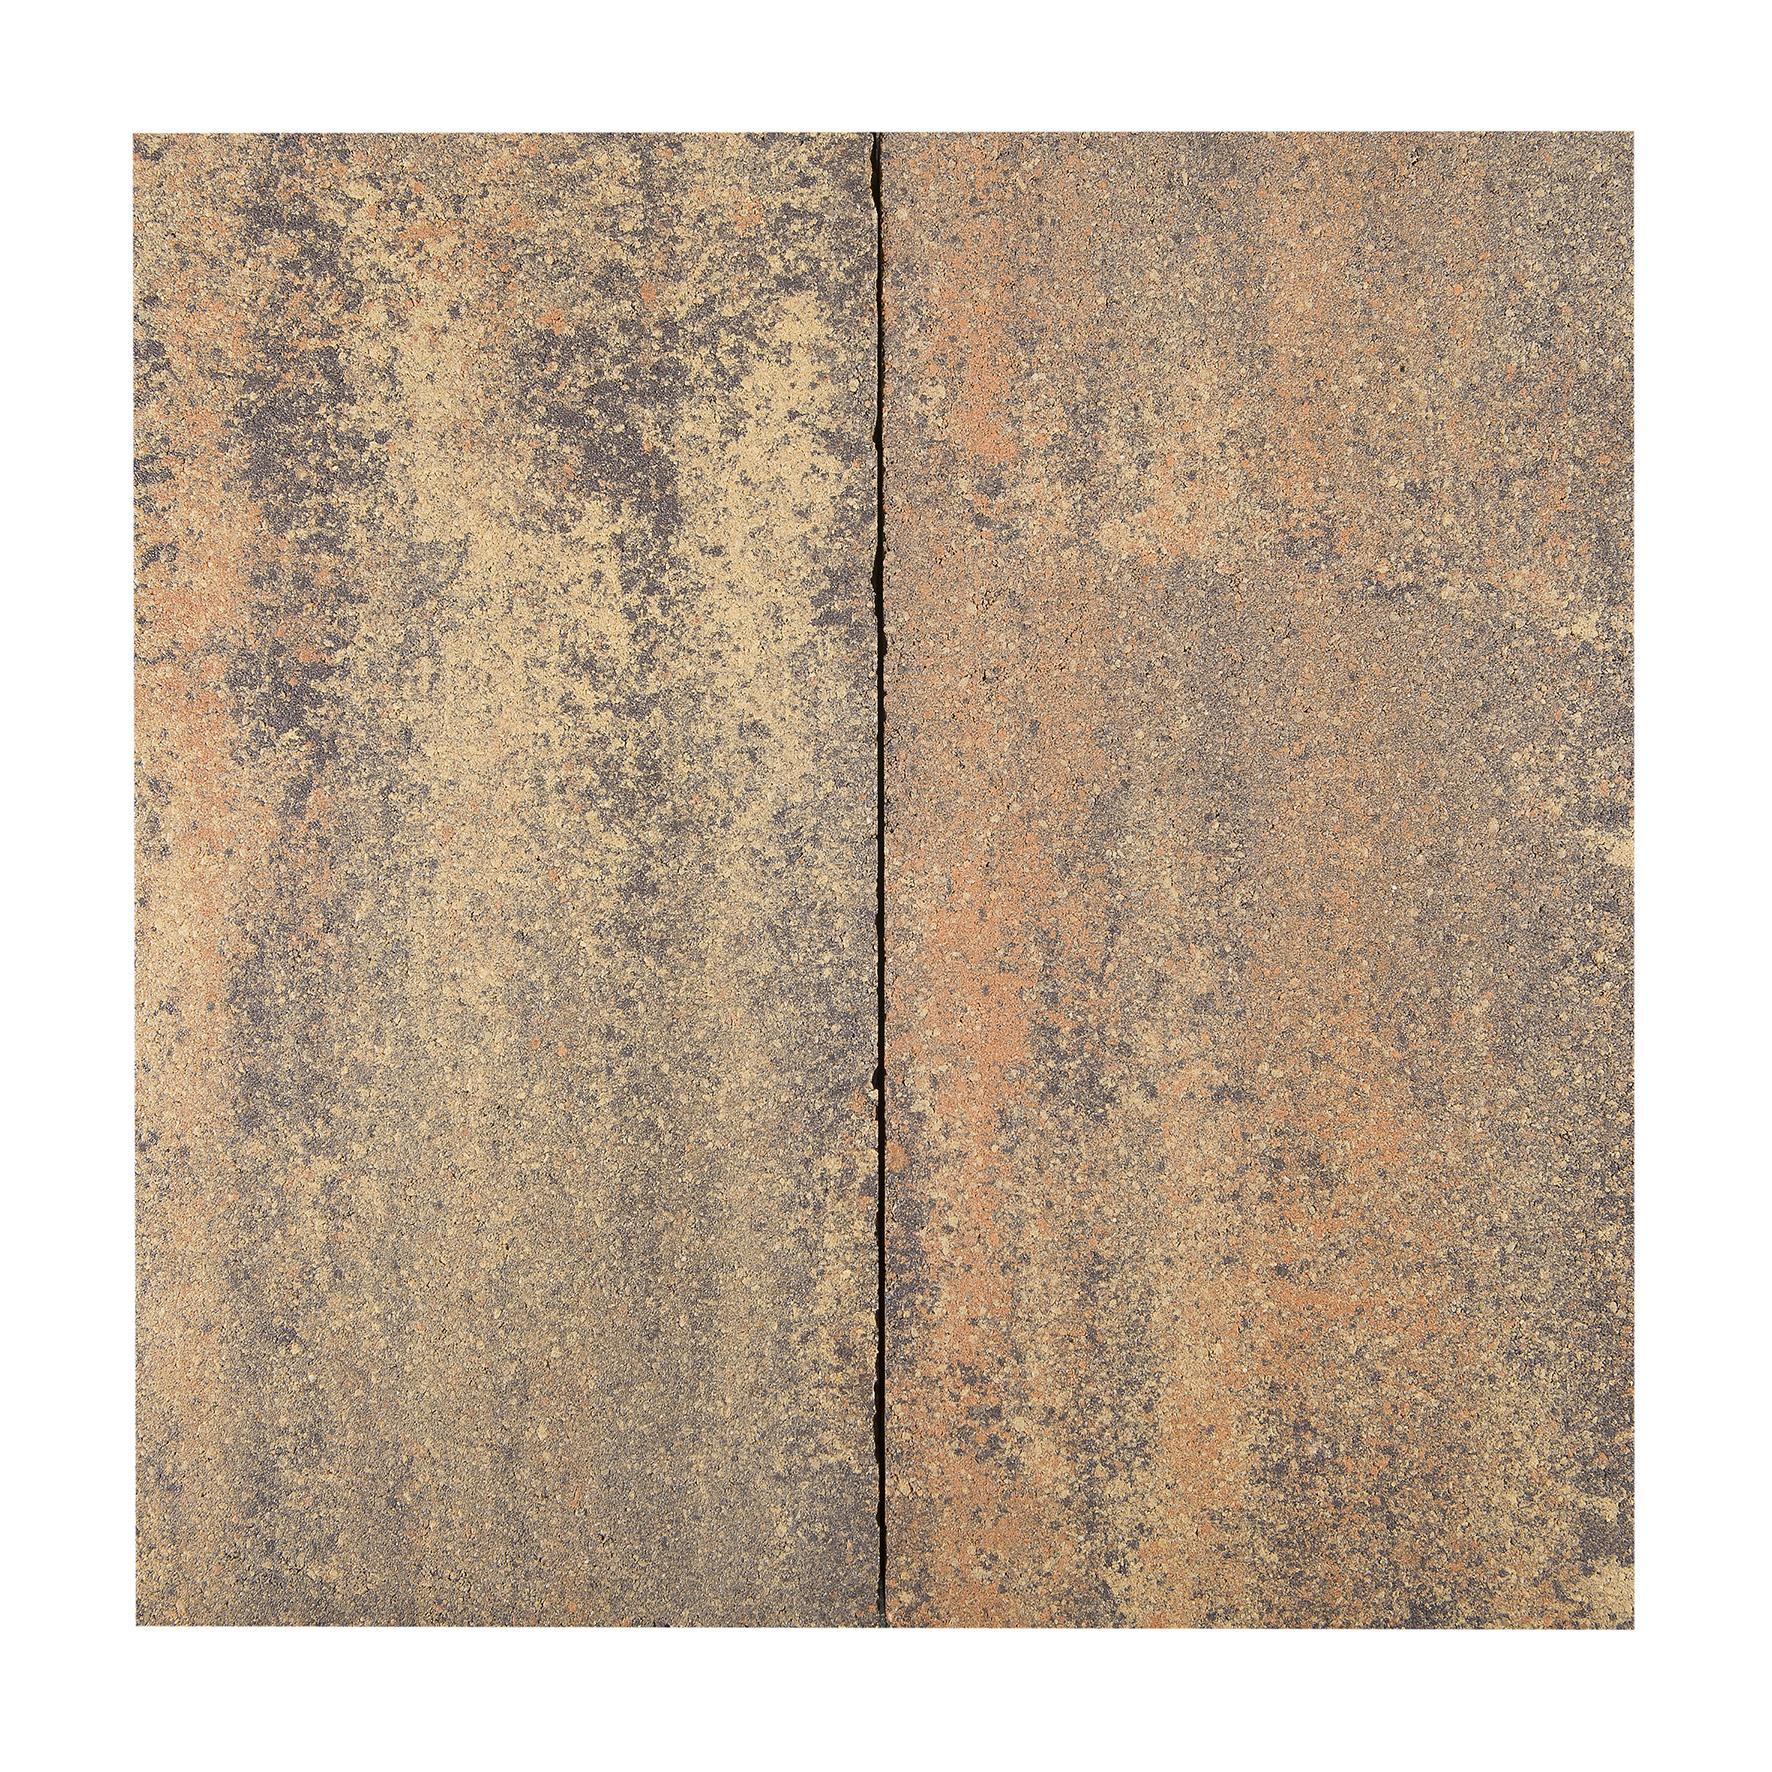 Gardenlux | Palace Tiles 30x60x6 | Windsor